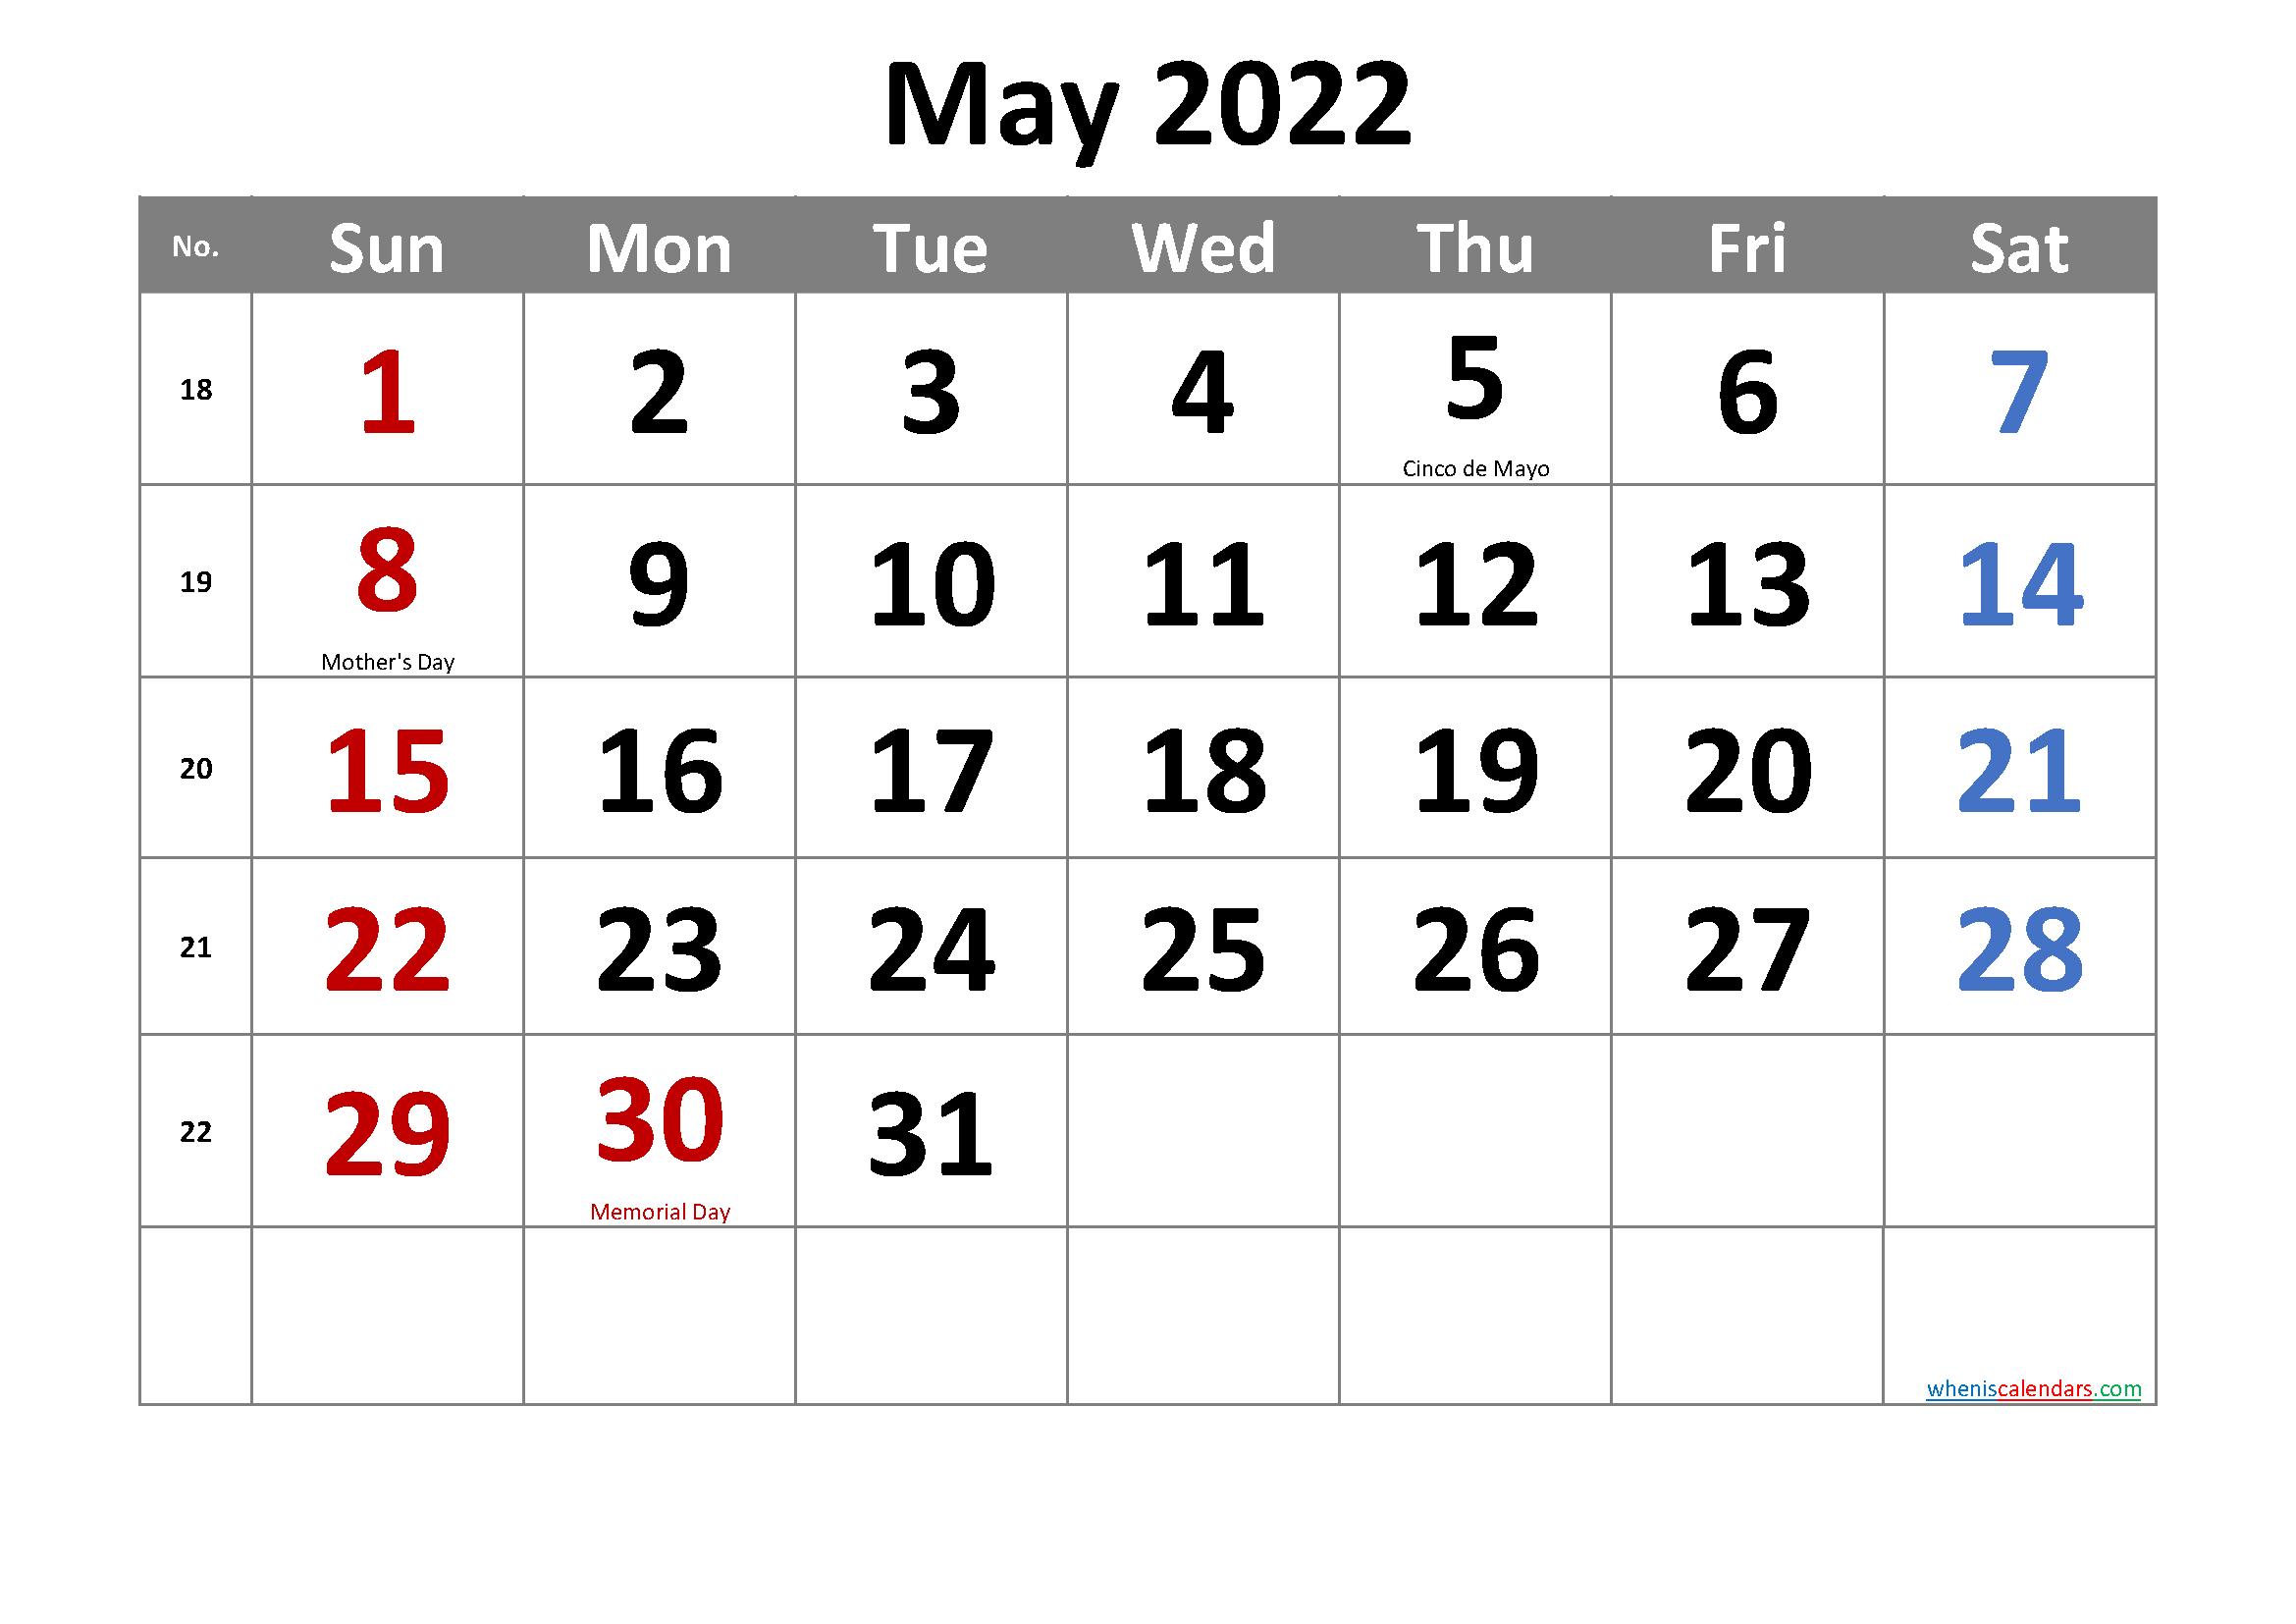 Free May 2022 Calendar Printable with regard to May 2022 Calendar Printable